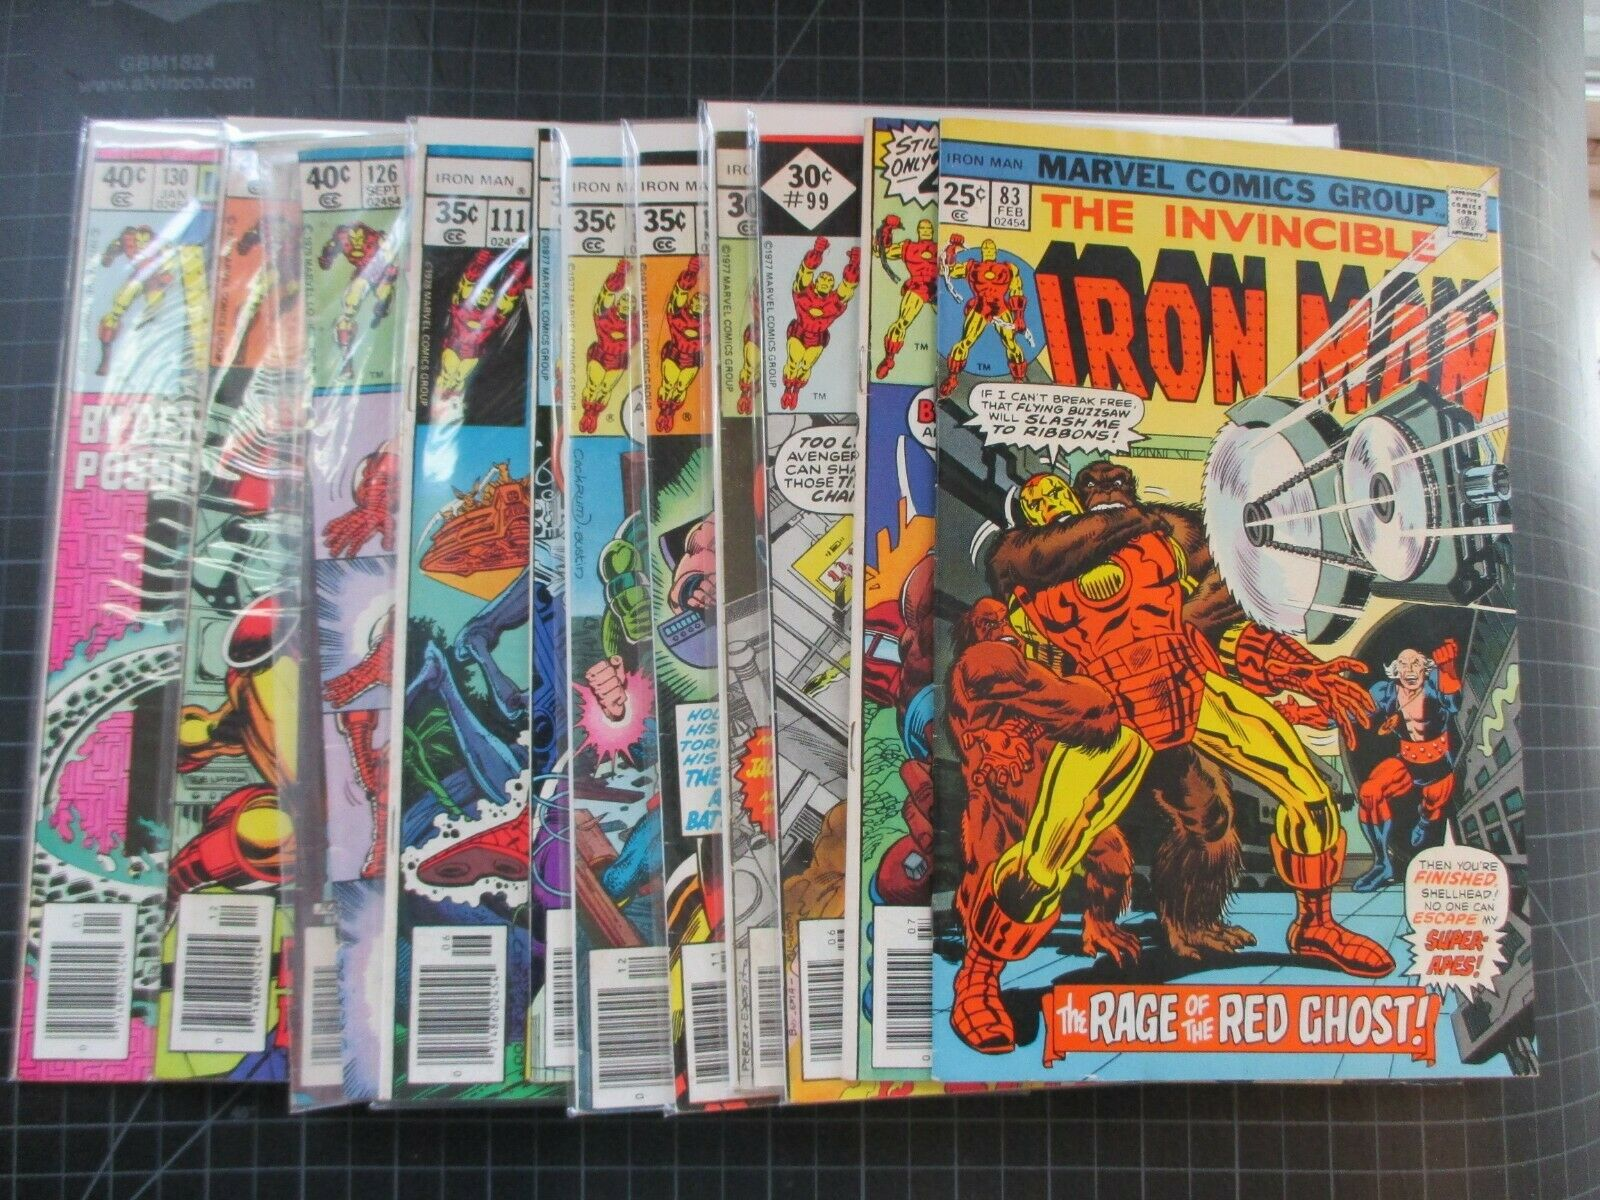 MARVEL IRON MAN #83,88,99,103-105,108,111,126,128-130 DEMON IN A BOTTLE